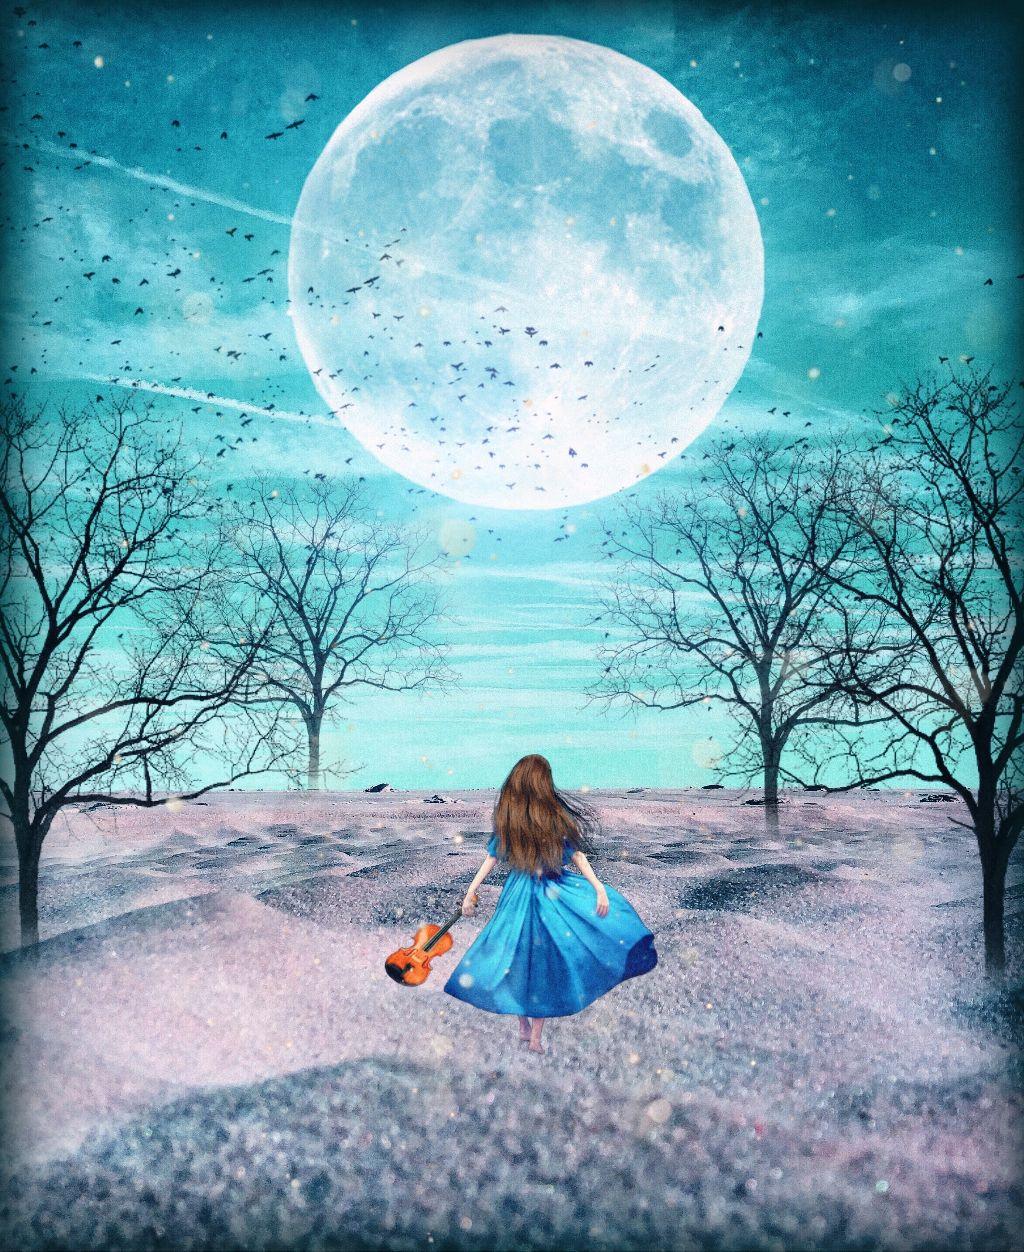 #freetoedit #fantasy #moonart